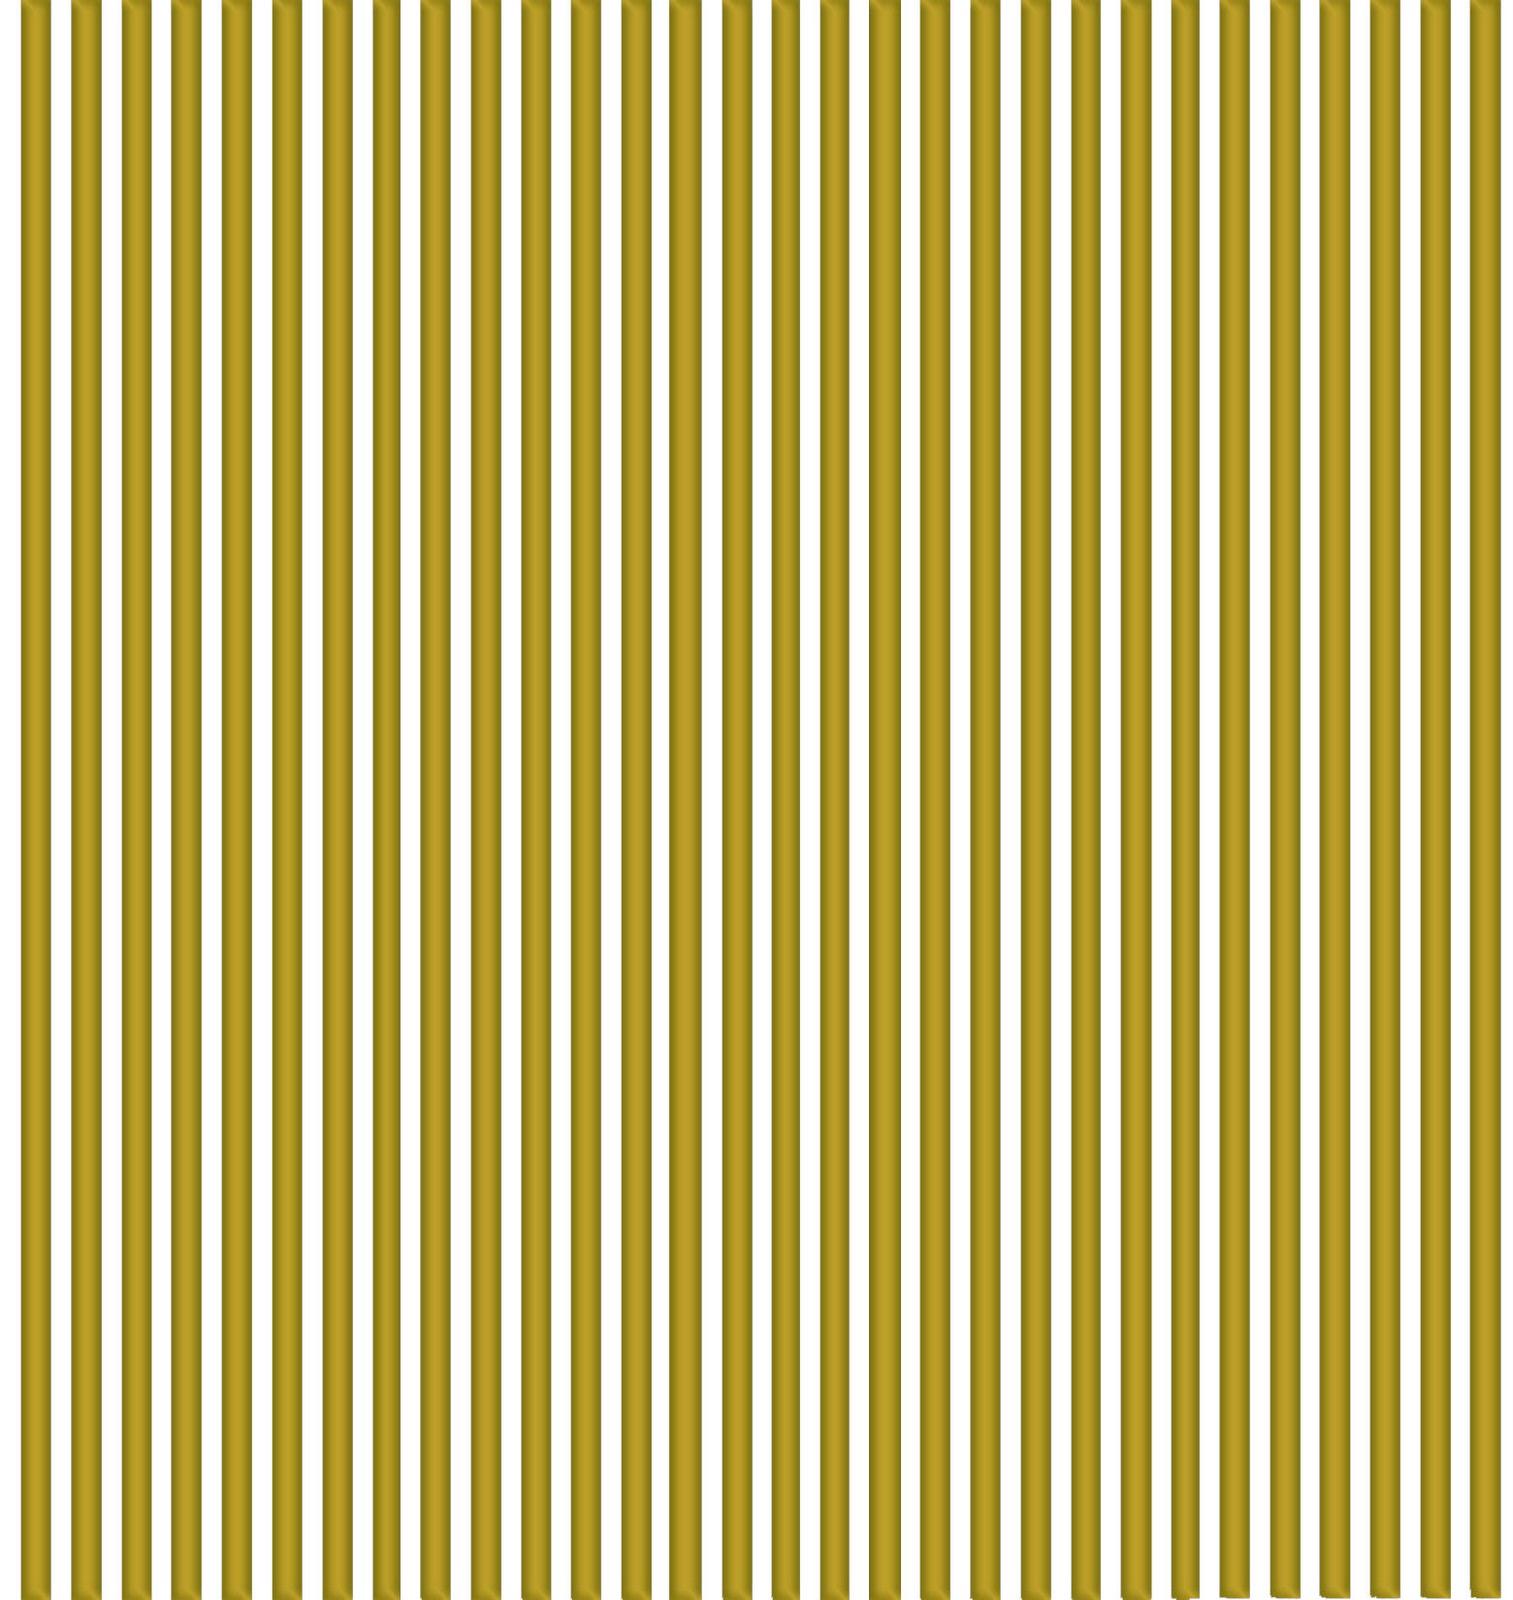 Gold Stripes Background